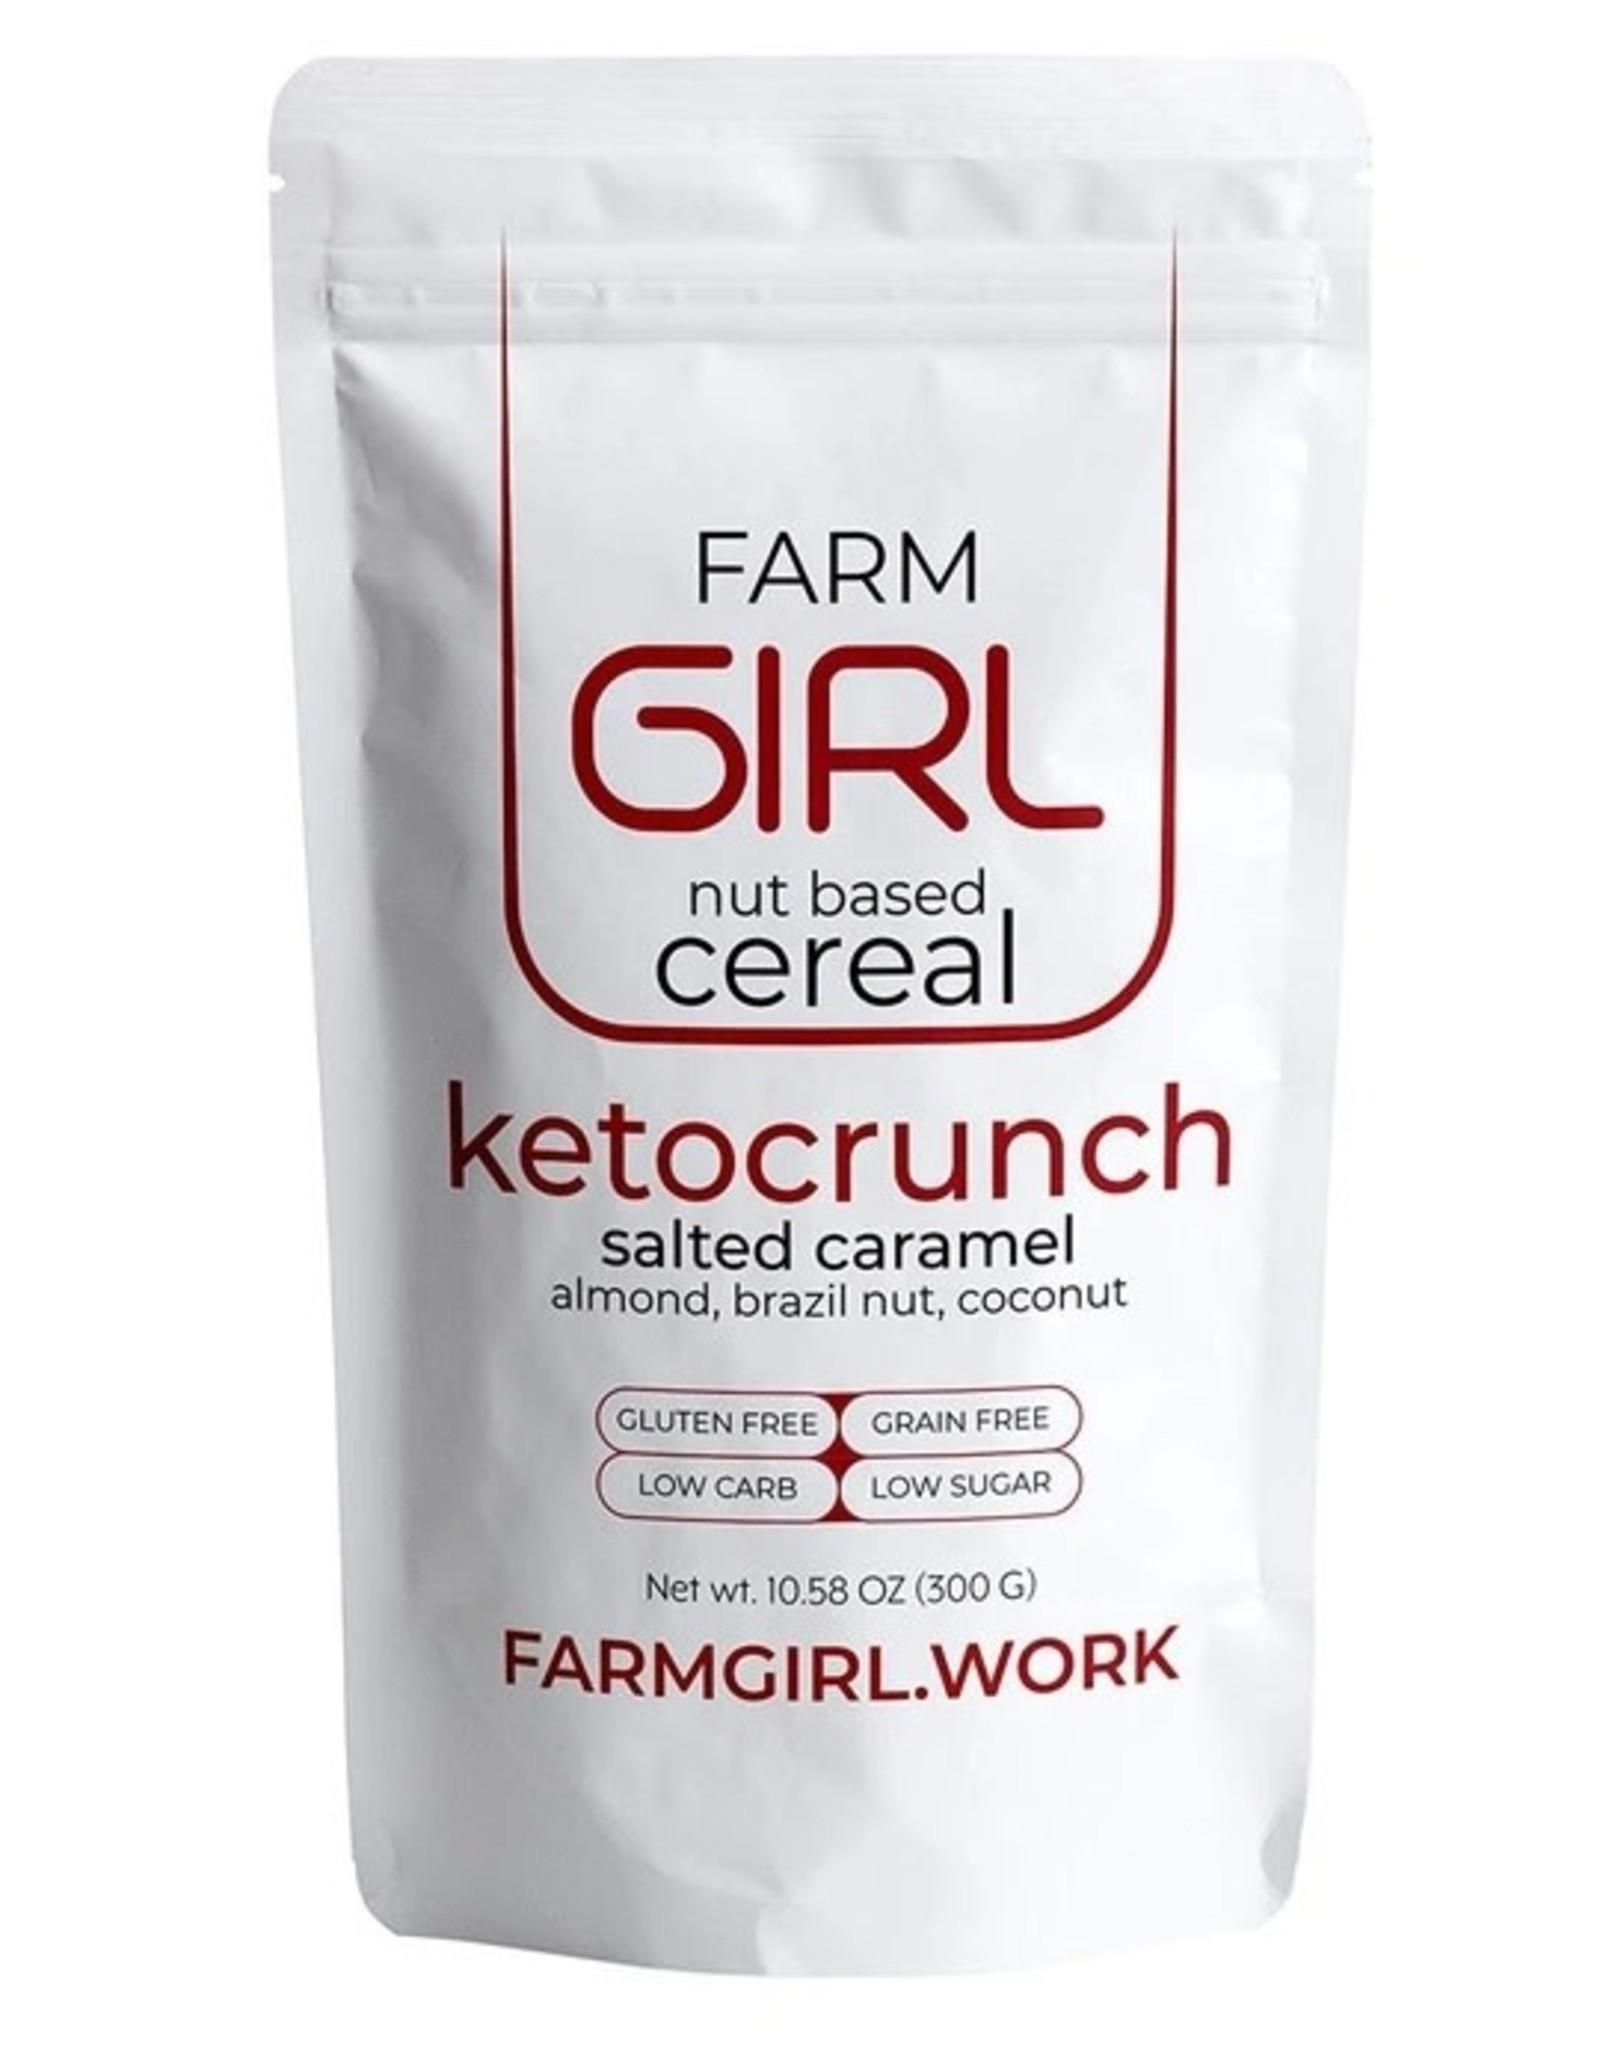 Farm Girl Farm Girl- Keto Cereal, Salted Caramel